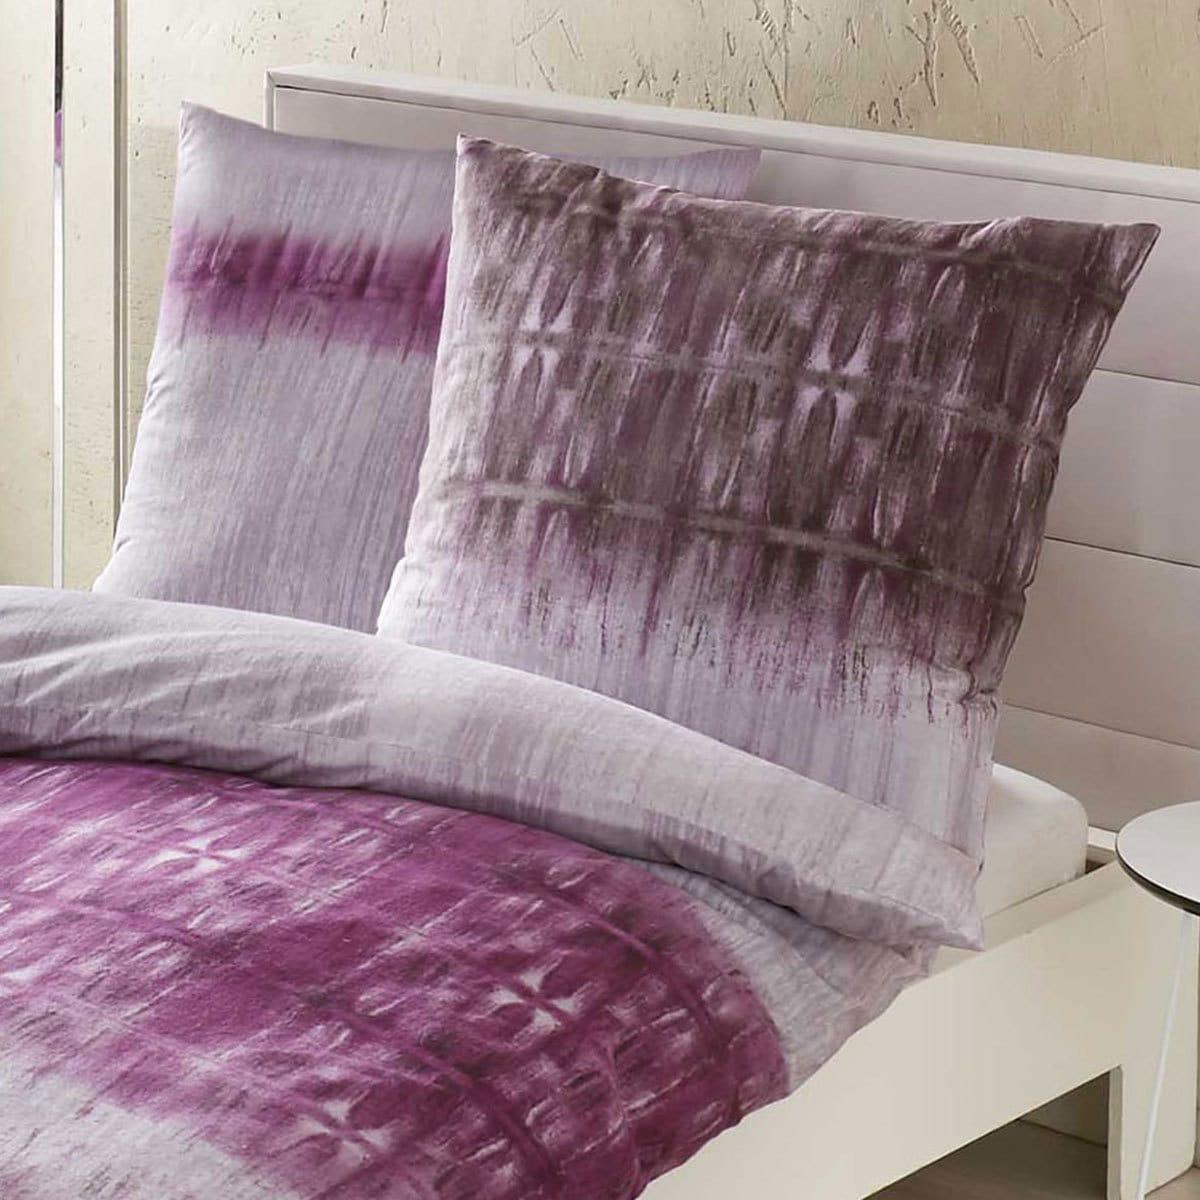 kaeppel biber bettw sche symmetry violett g nstig online kaufen bei bettwaren shop. Black Bedroom Furniture Sets. Home Design Ideas